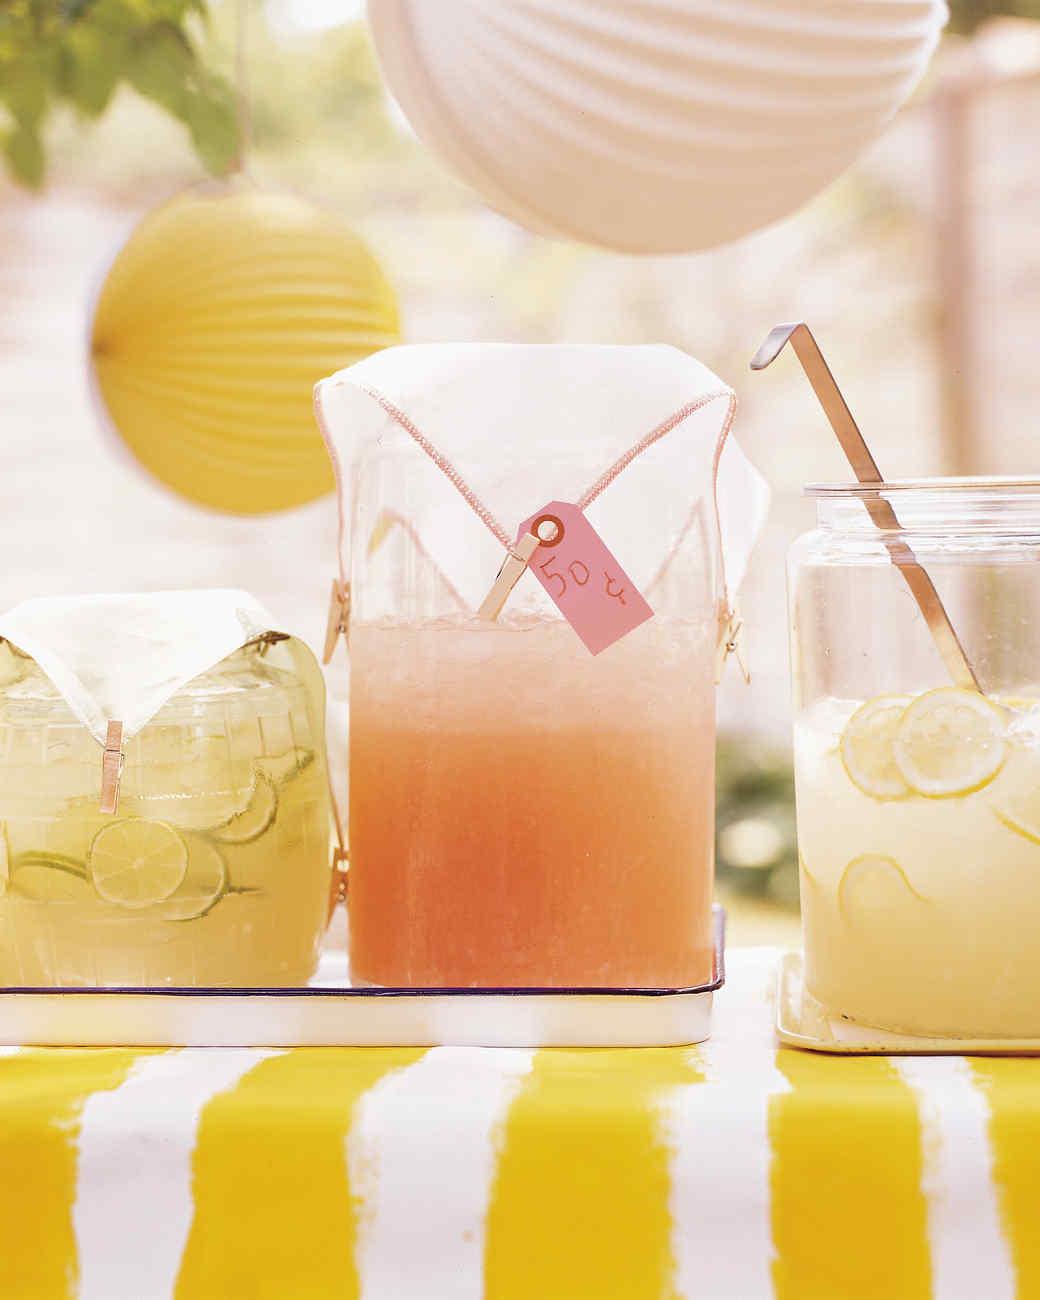 Lemonade, Pink Lemonade, Limeade